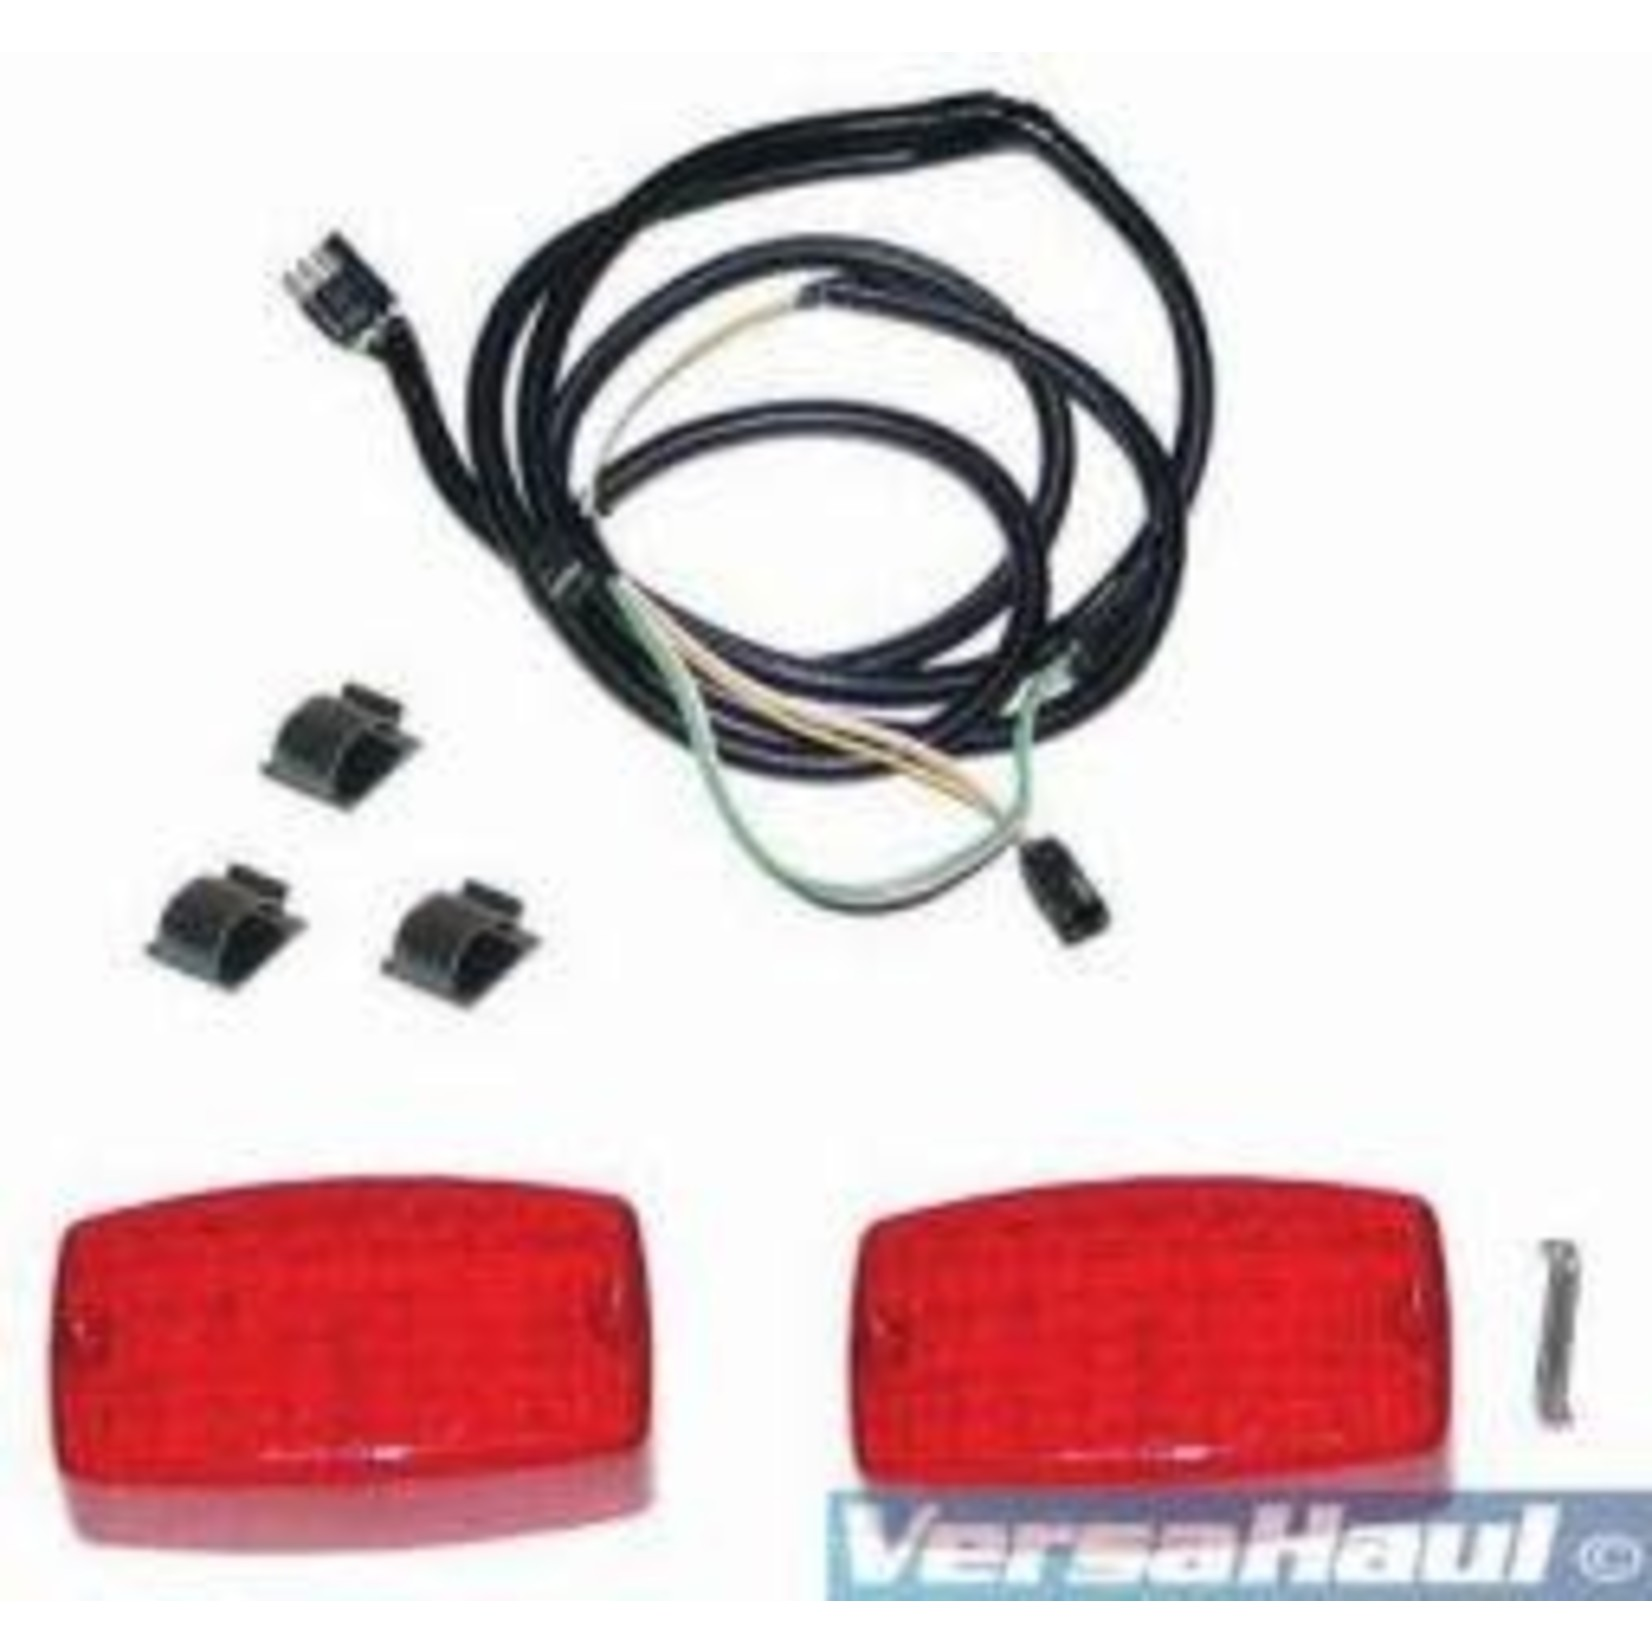 Accessories Versa Haul Tail Light Kit